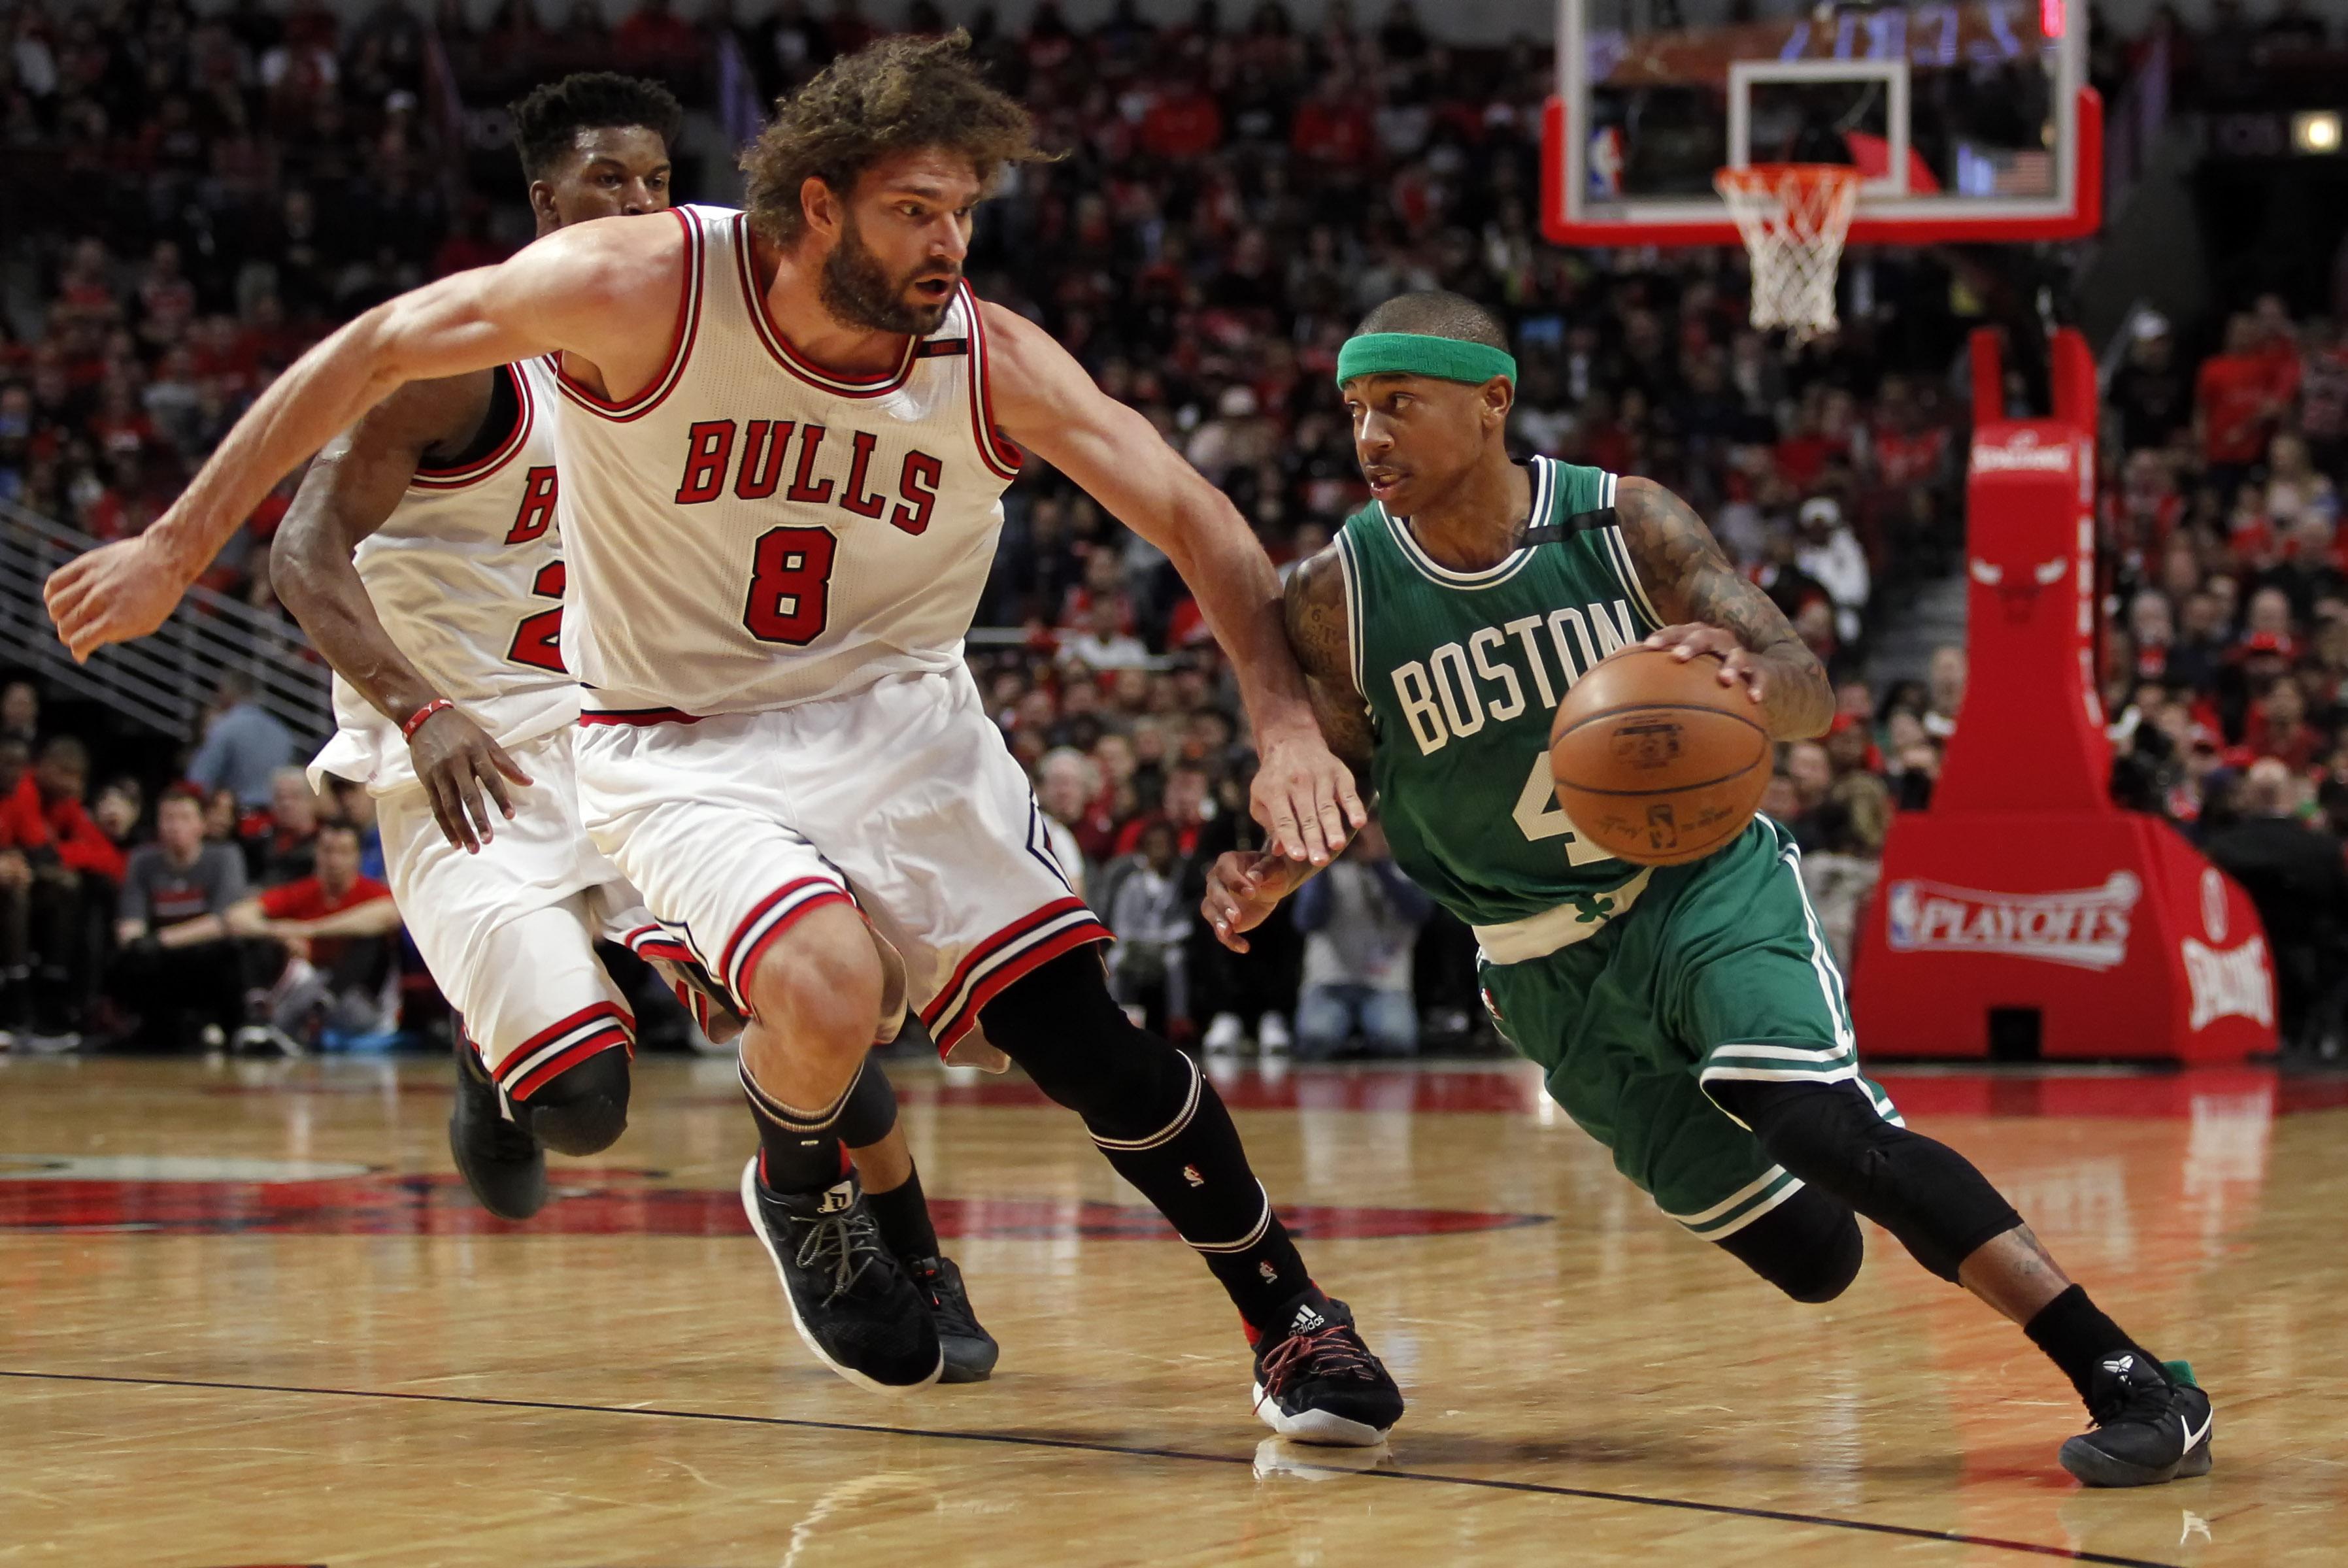 10024272-nba-playoffs-boston-celtics-at-chicago-bulls-2